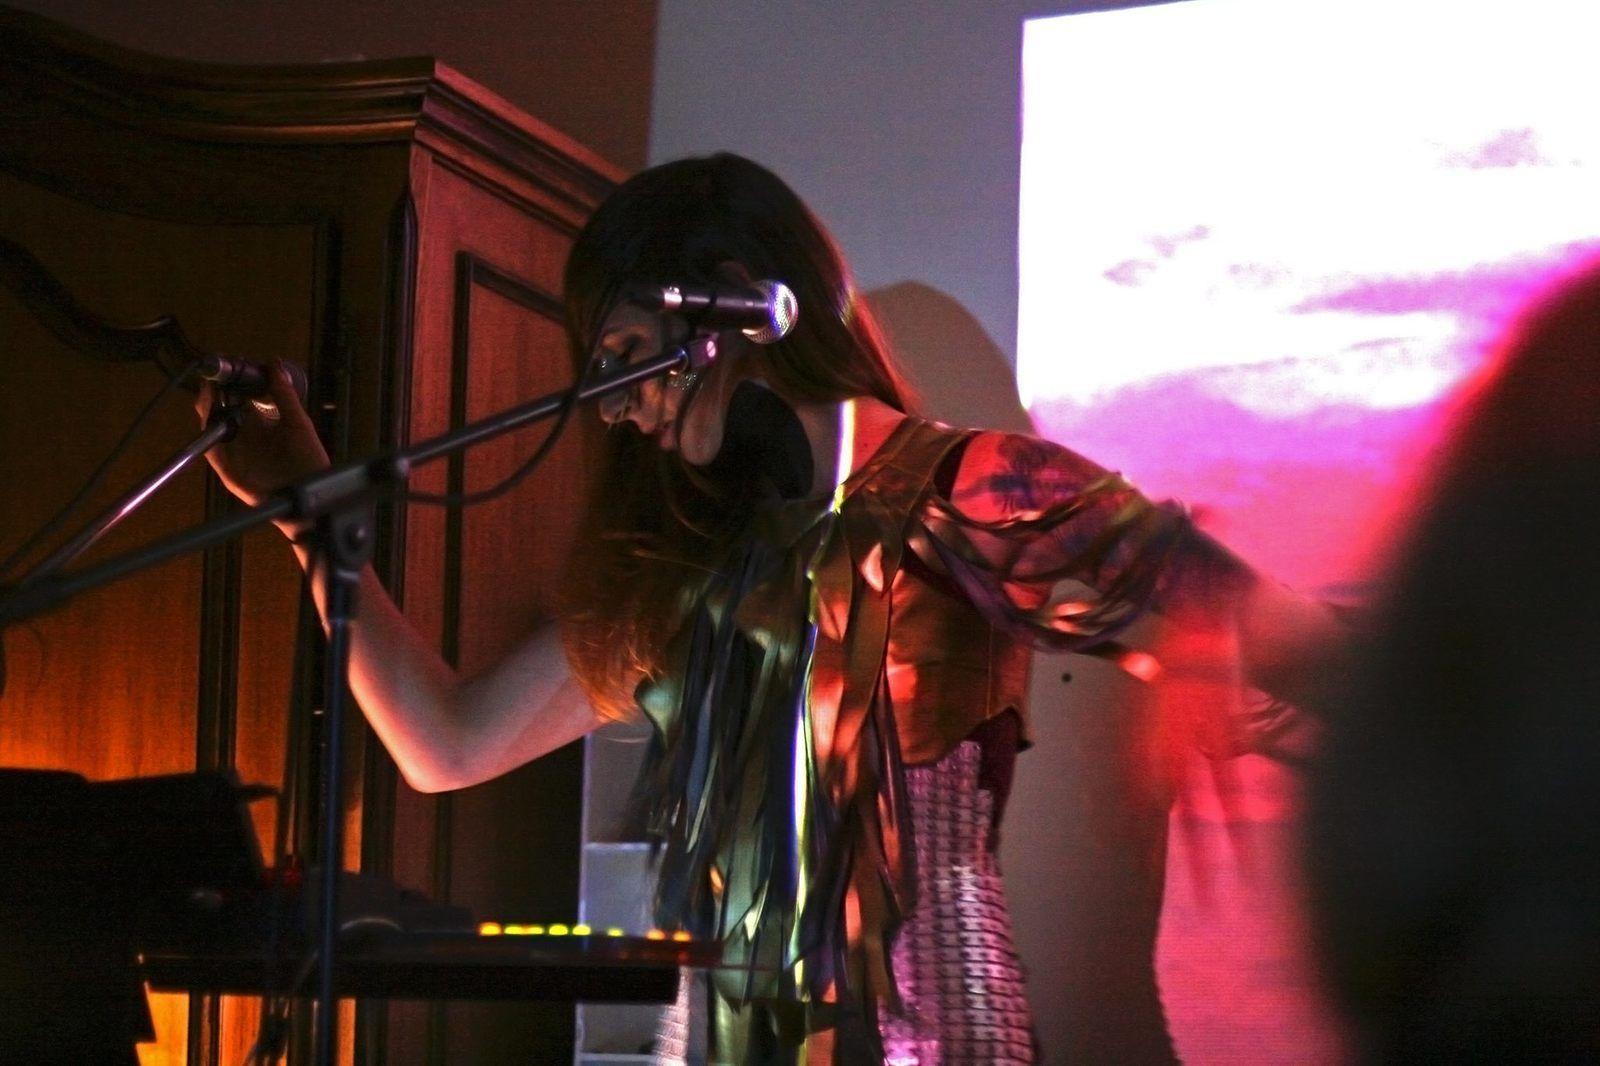 Cigüri (F) @ Home concert (Uccle / Vanderkindere) - 30/11/2014